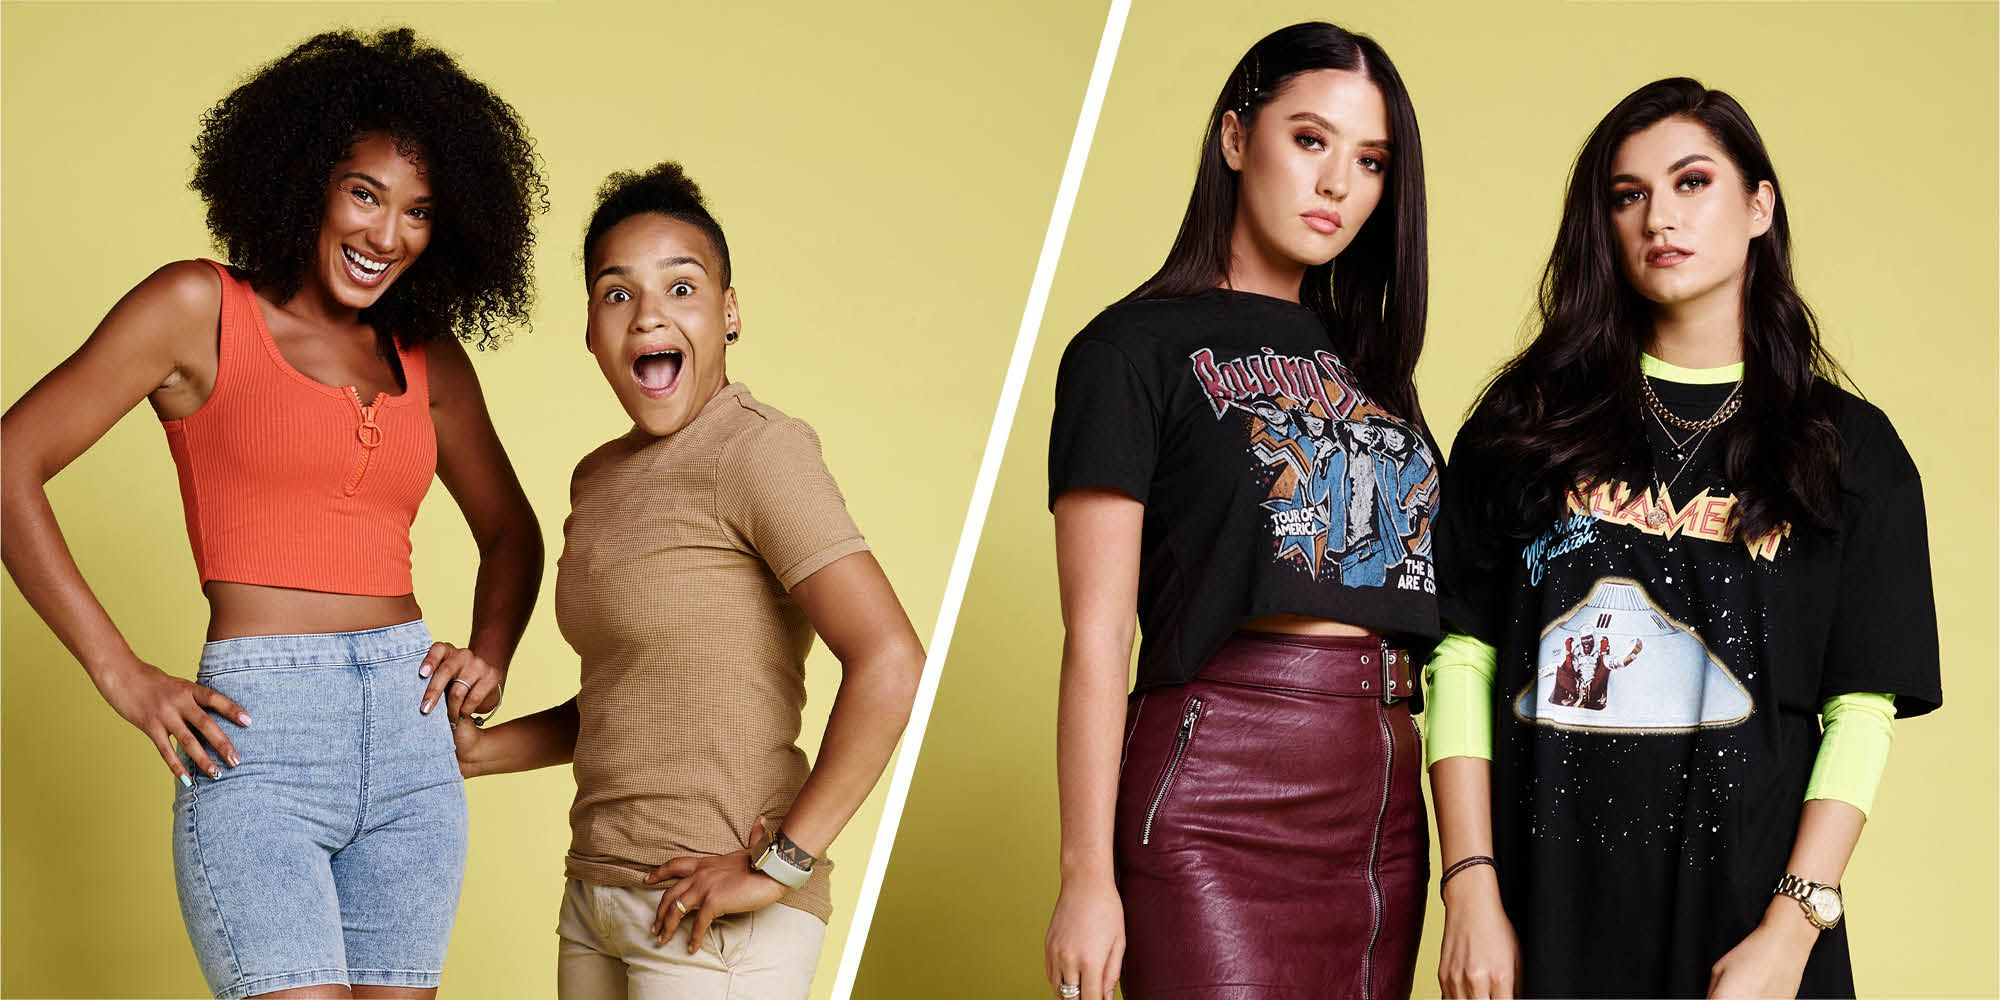 Meet the new (very queer) cast of MTV's True Love or True Lies